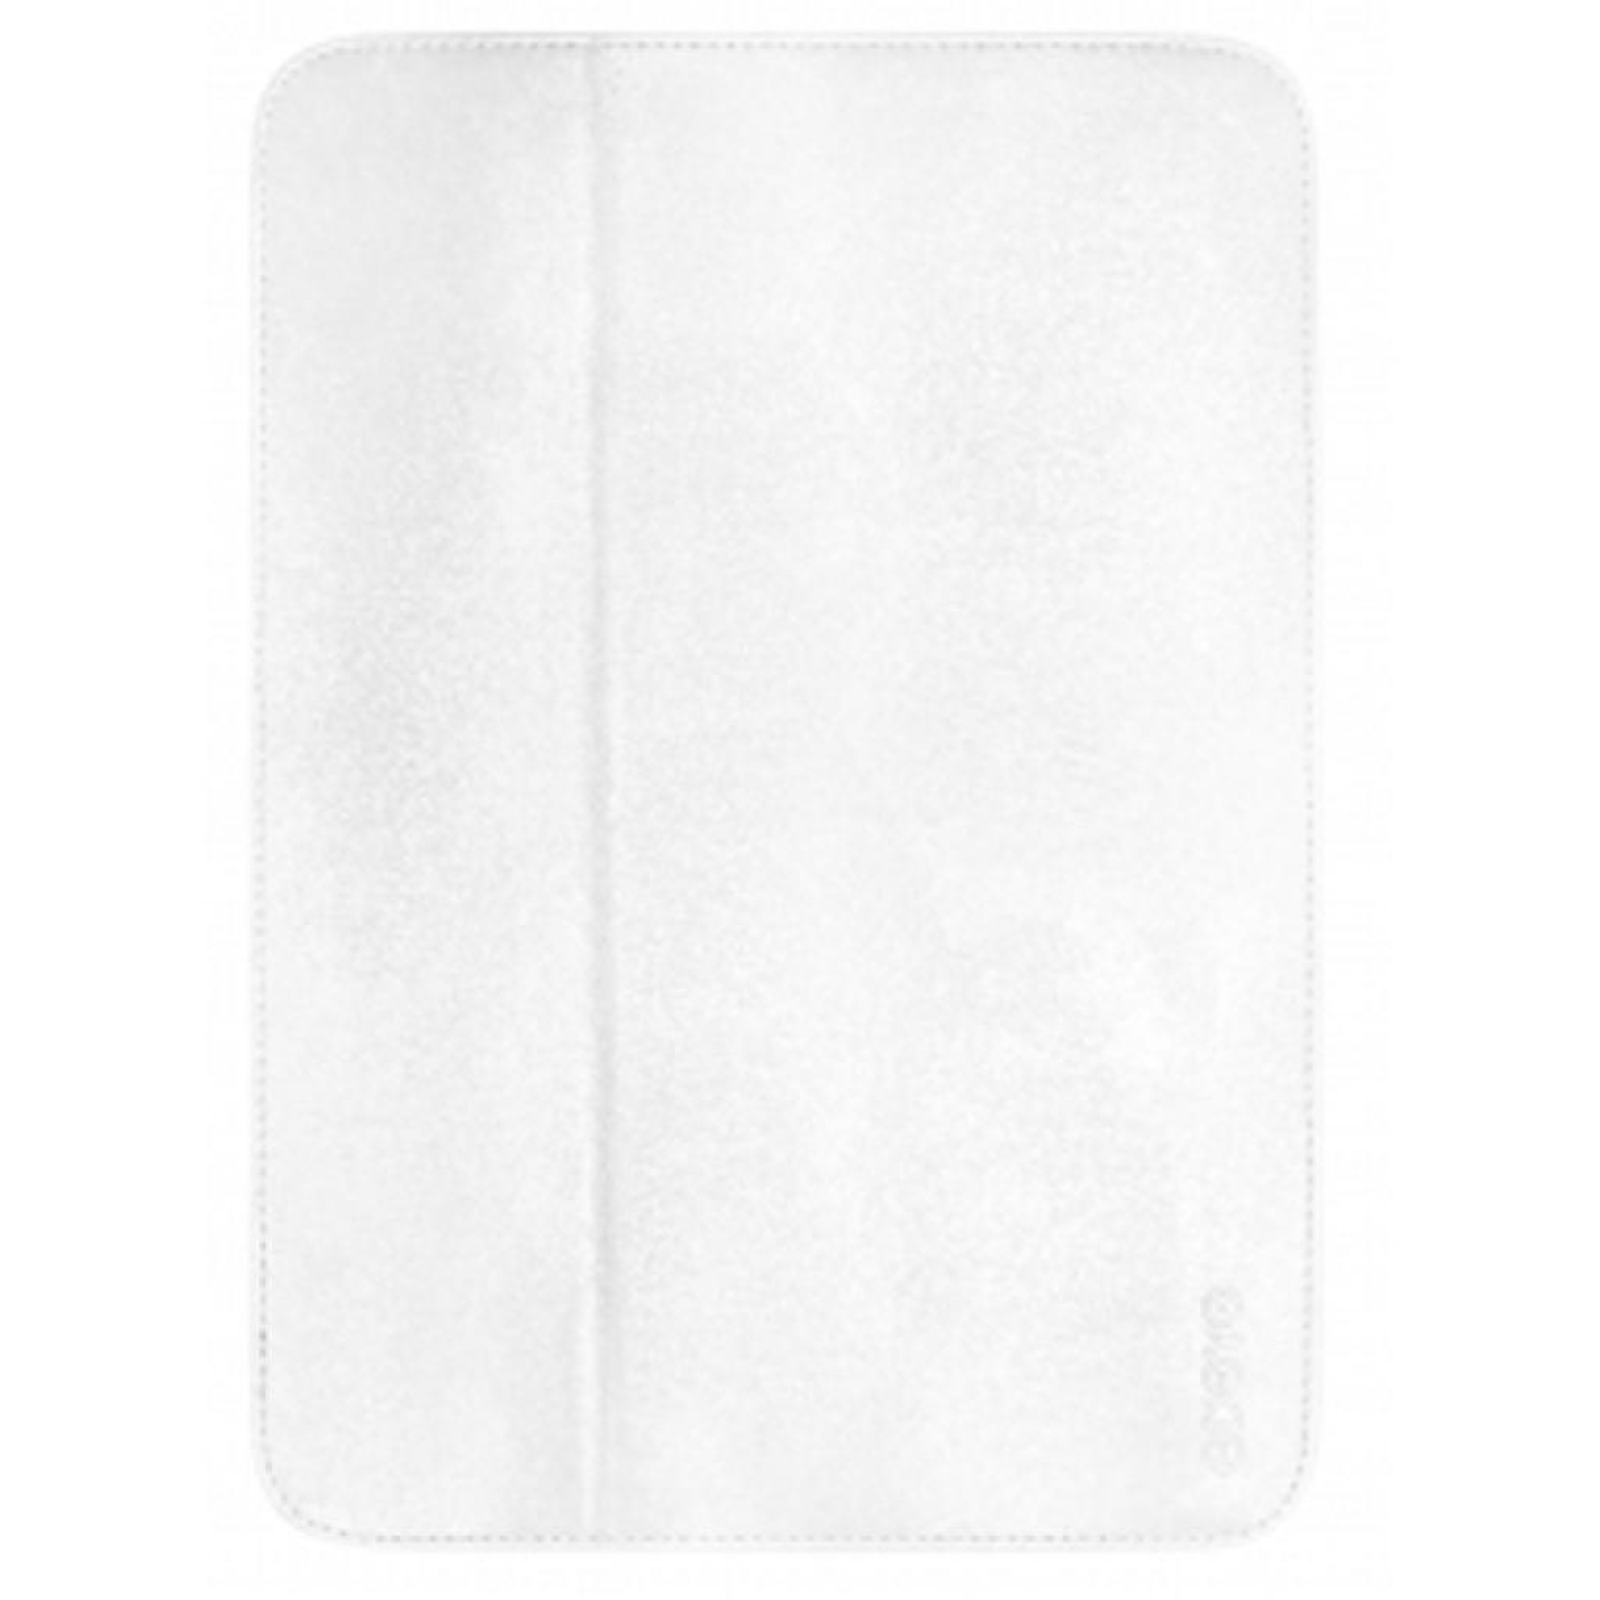 Чехол для планшета ODOYO Galaxy TAB3 10.1 /GLITZ COAT FOLIO COTTON WHITE (PH625WH)